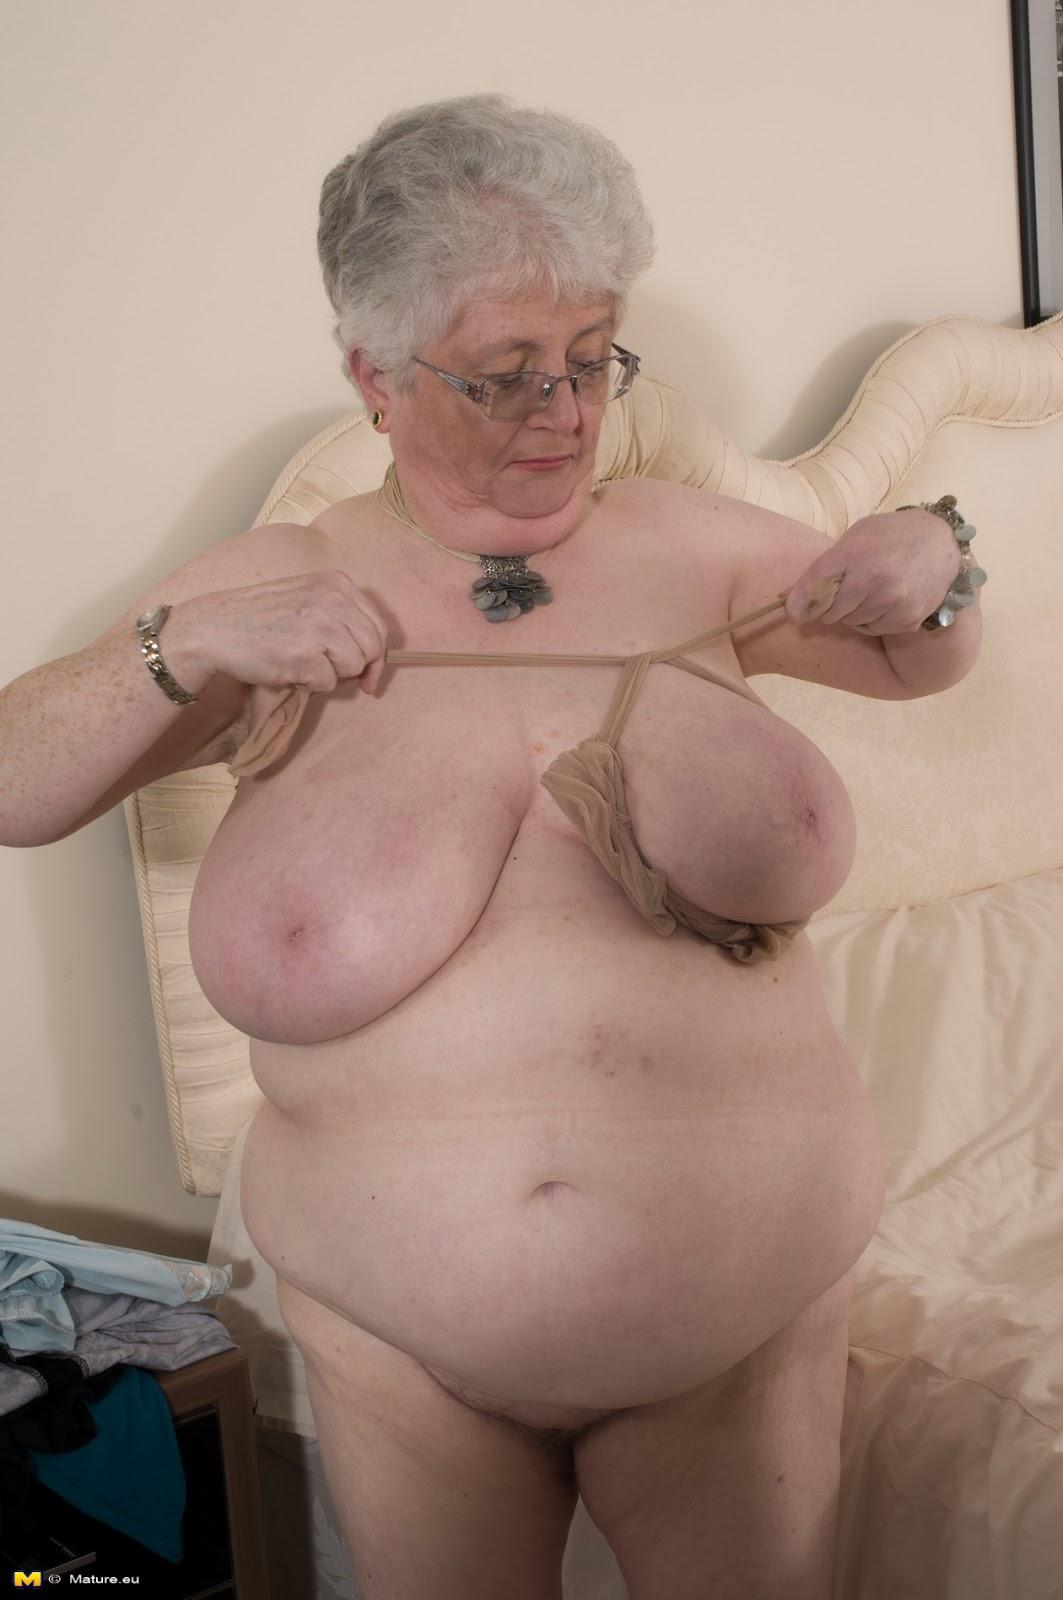 Schwiegermutter in nylons